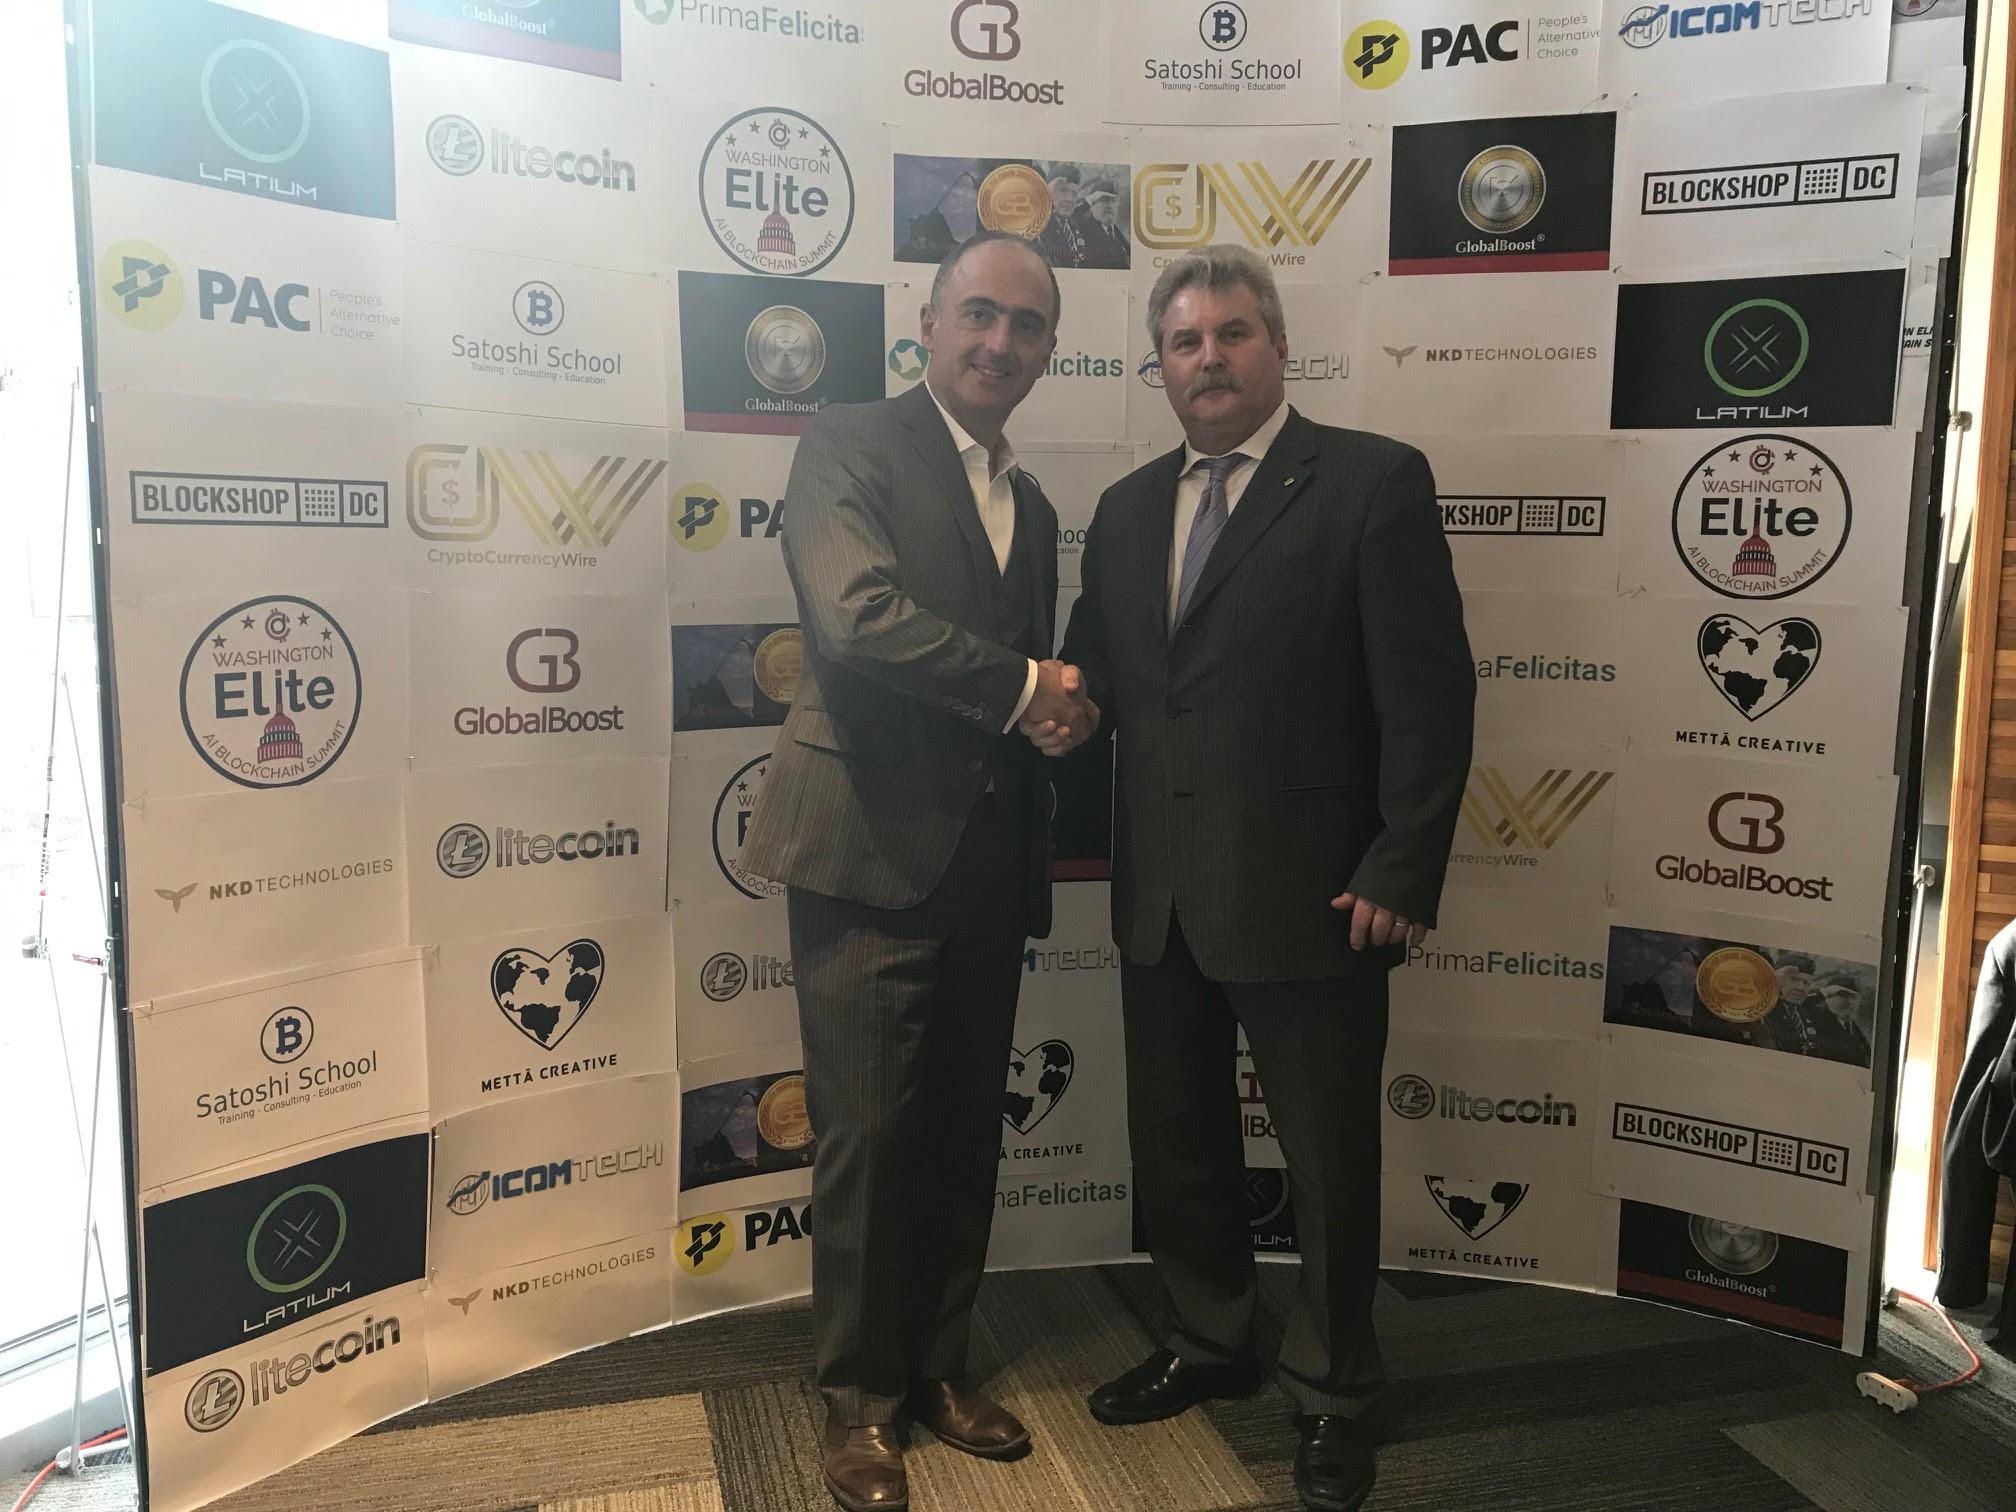 2019 Washington Elite AI and Blockchain Summit